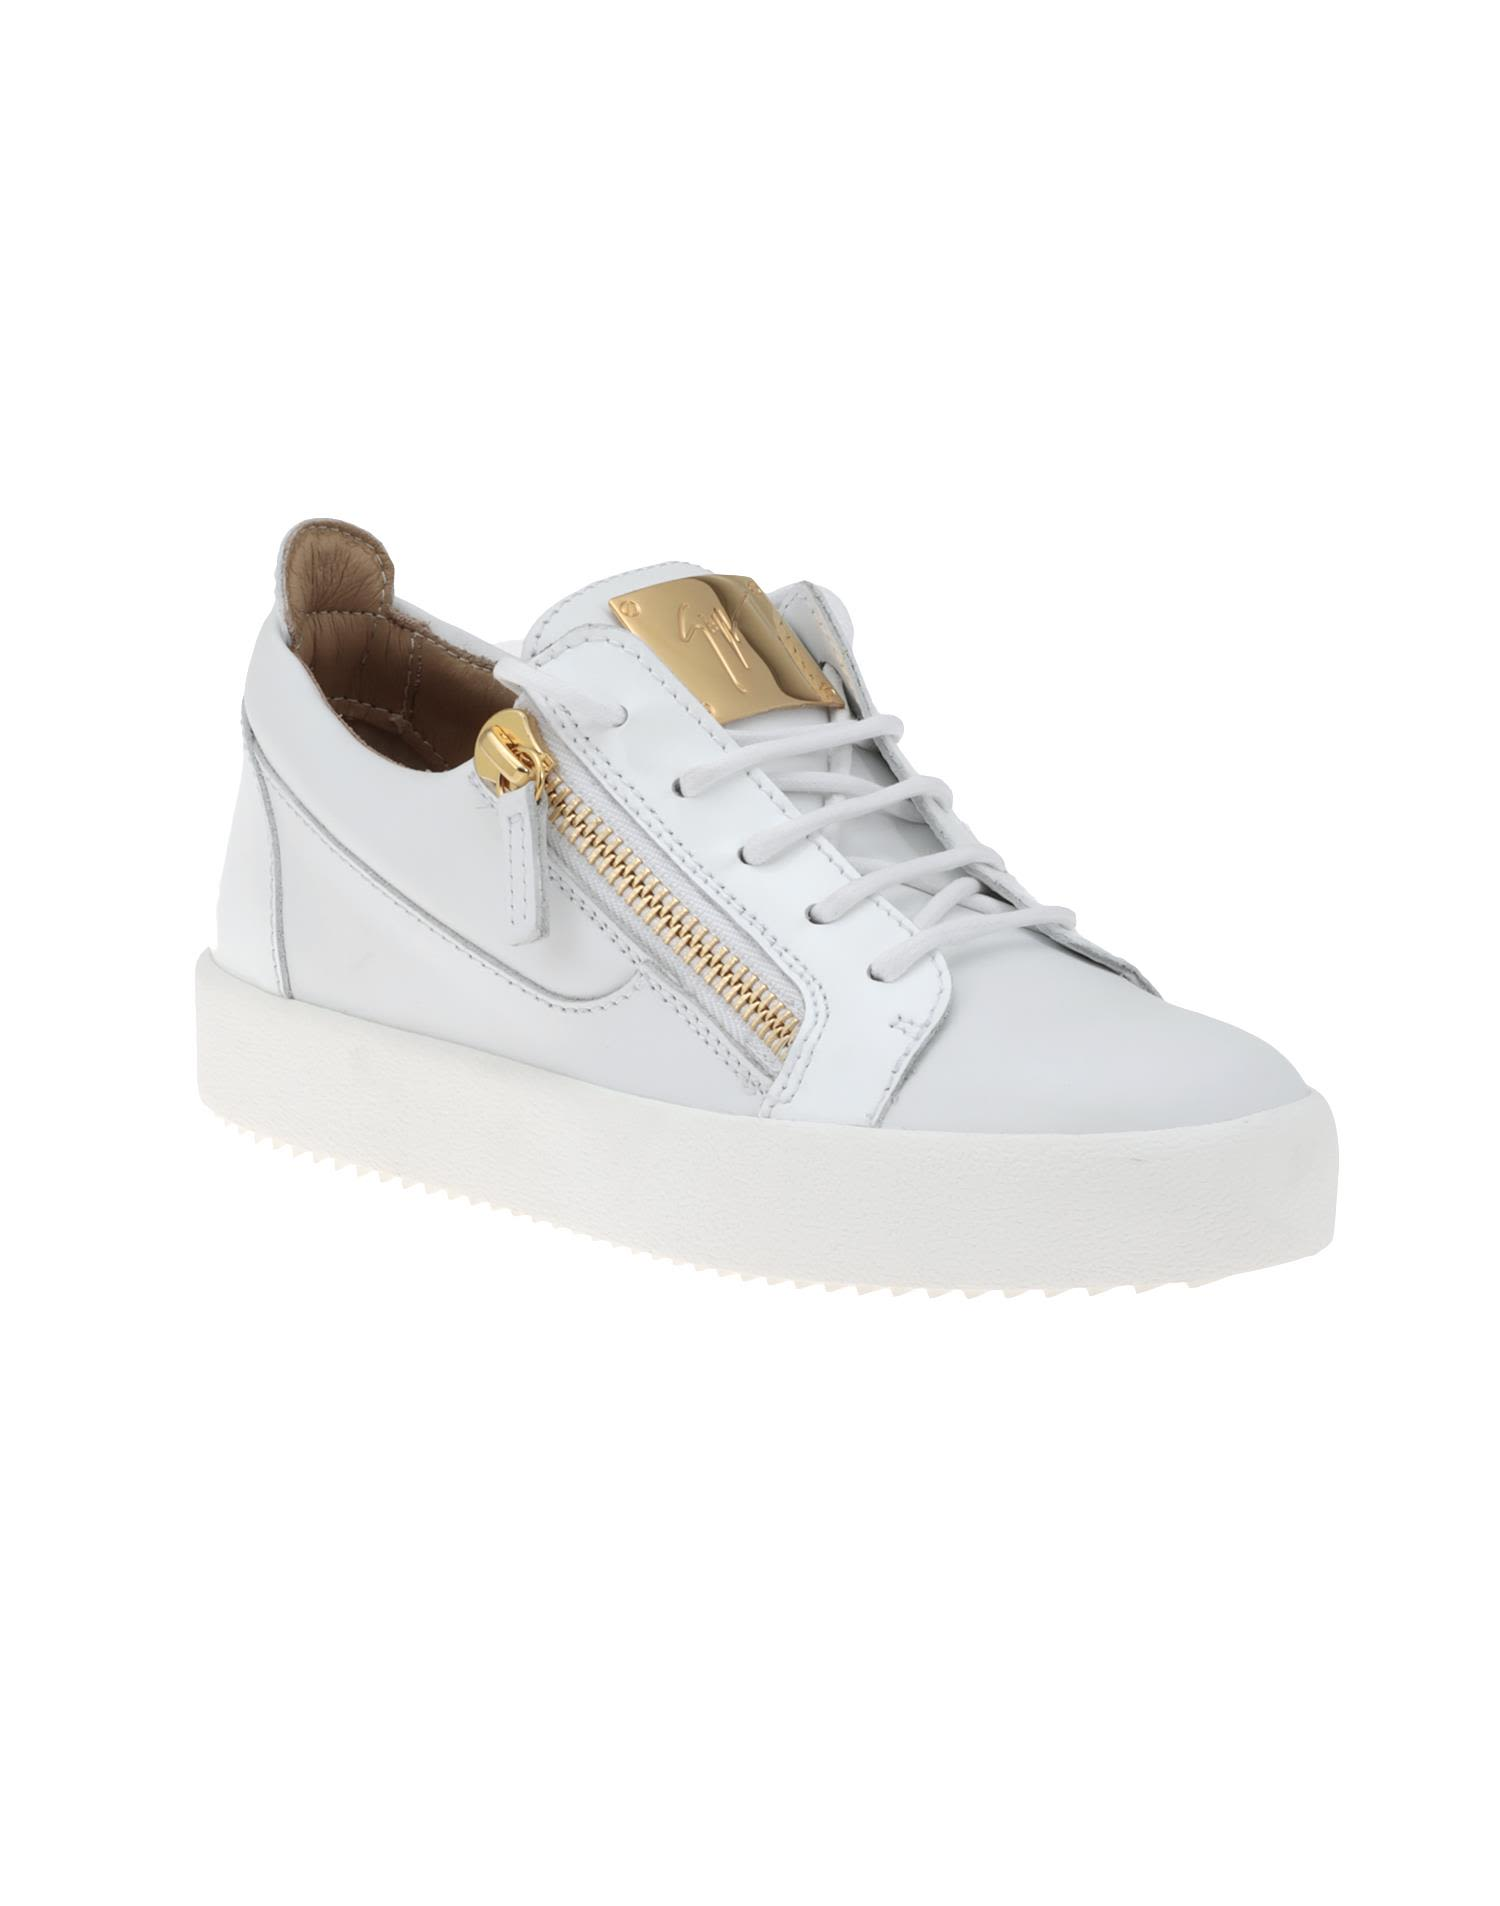 0c5bcdcd02d63 Giuseppe Zanotti Nicki Sneakers - White Giuseppe Zanotti Nicki Sneakers -  White ...